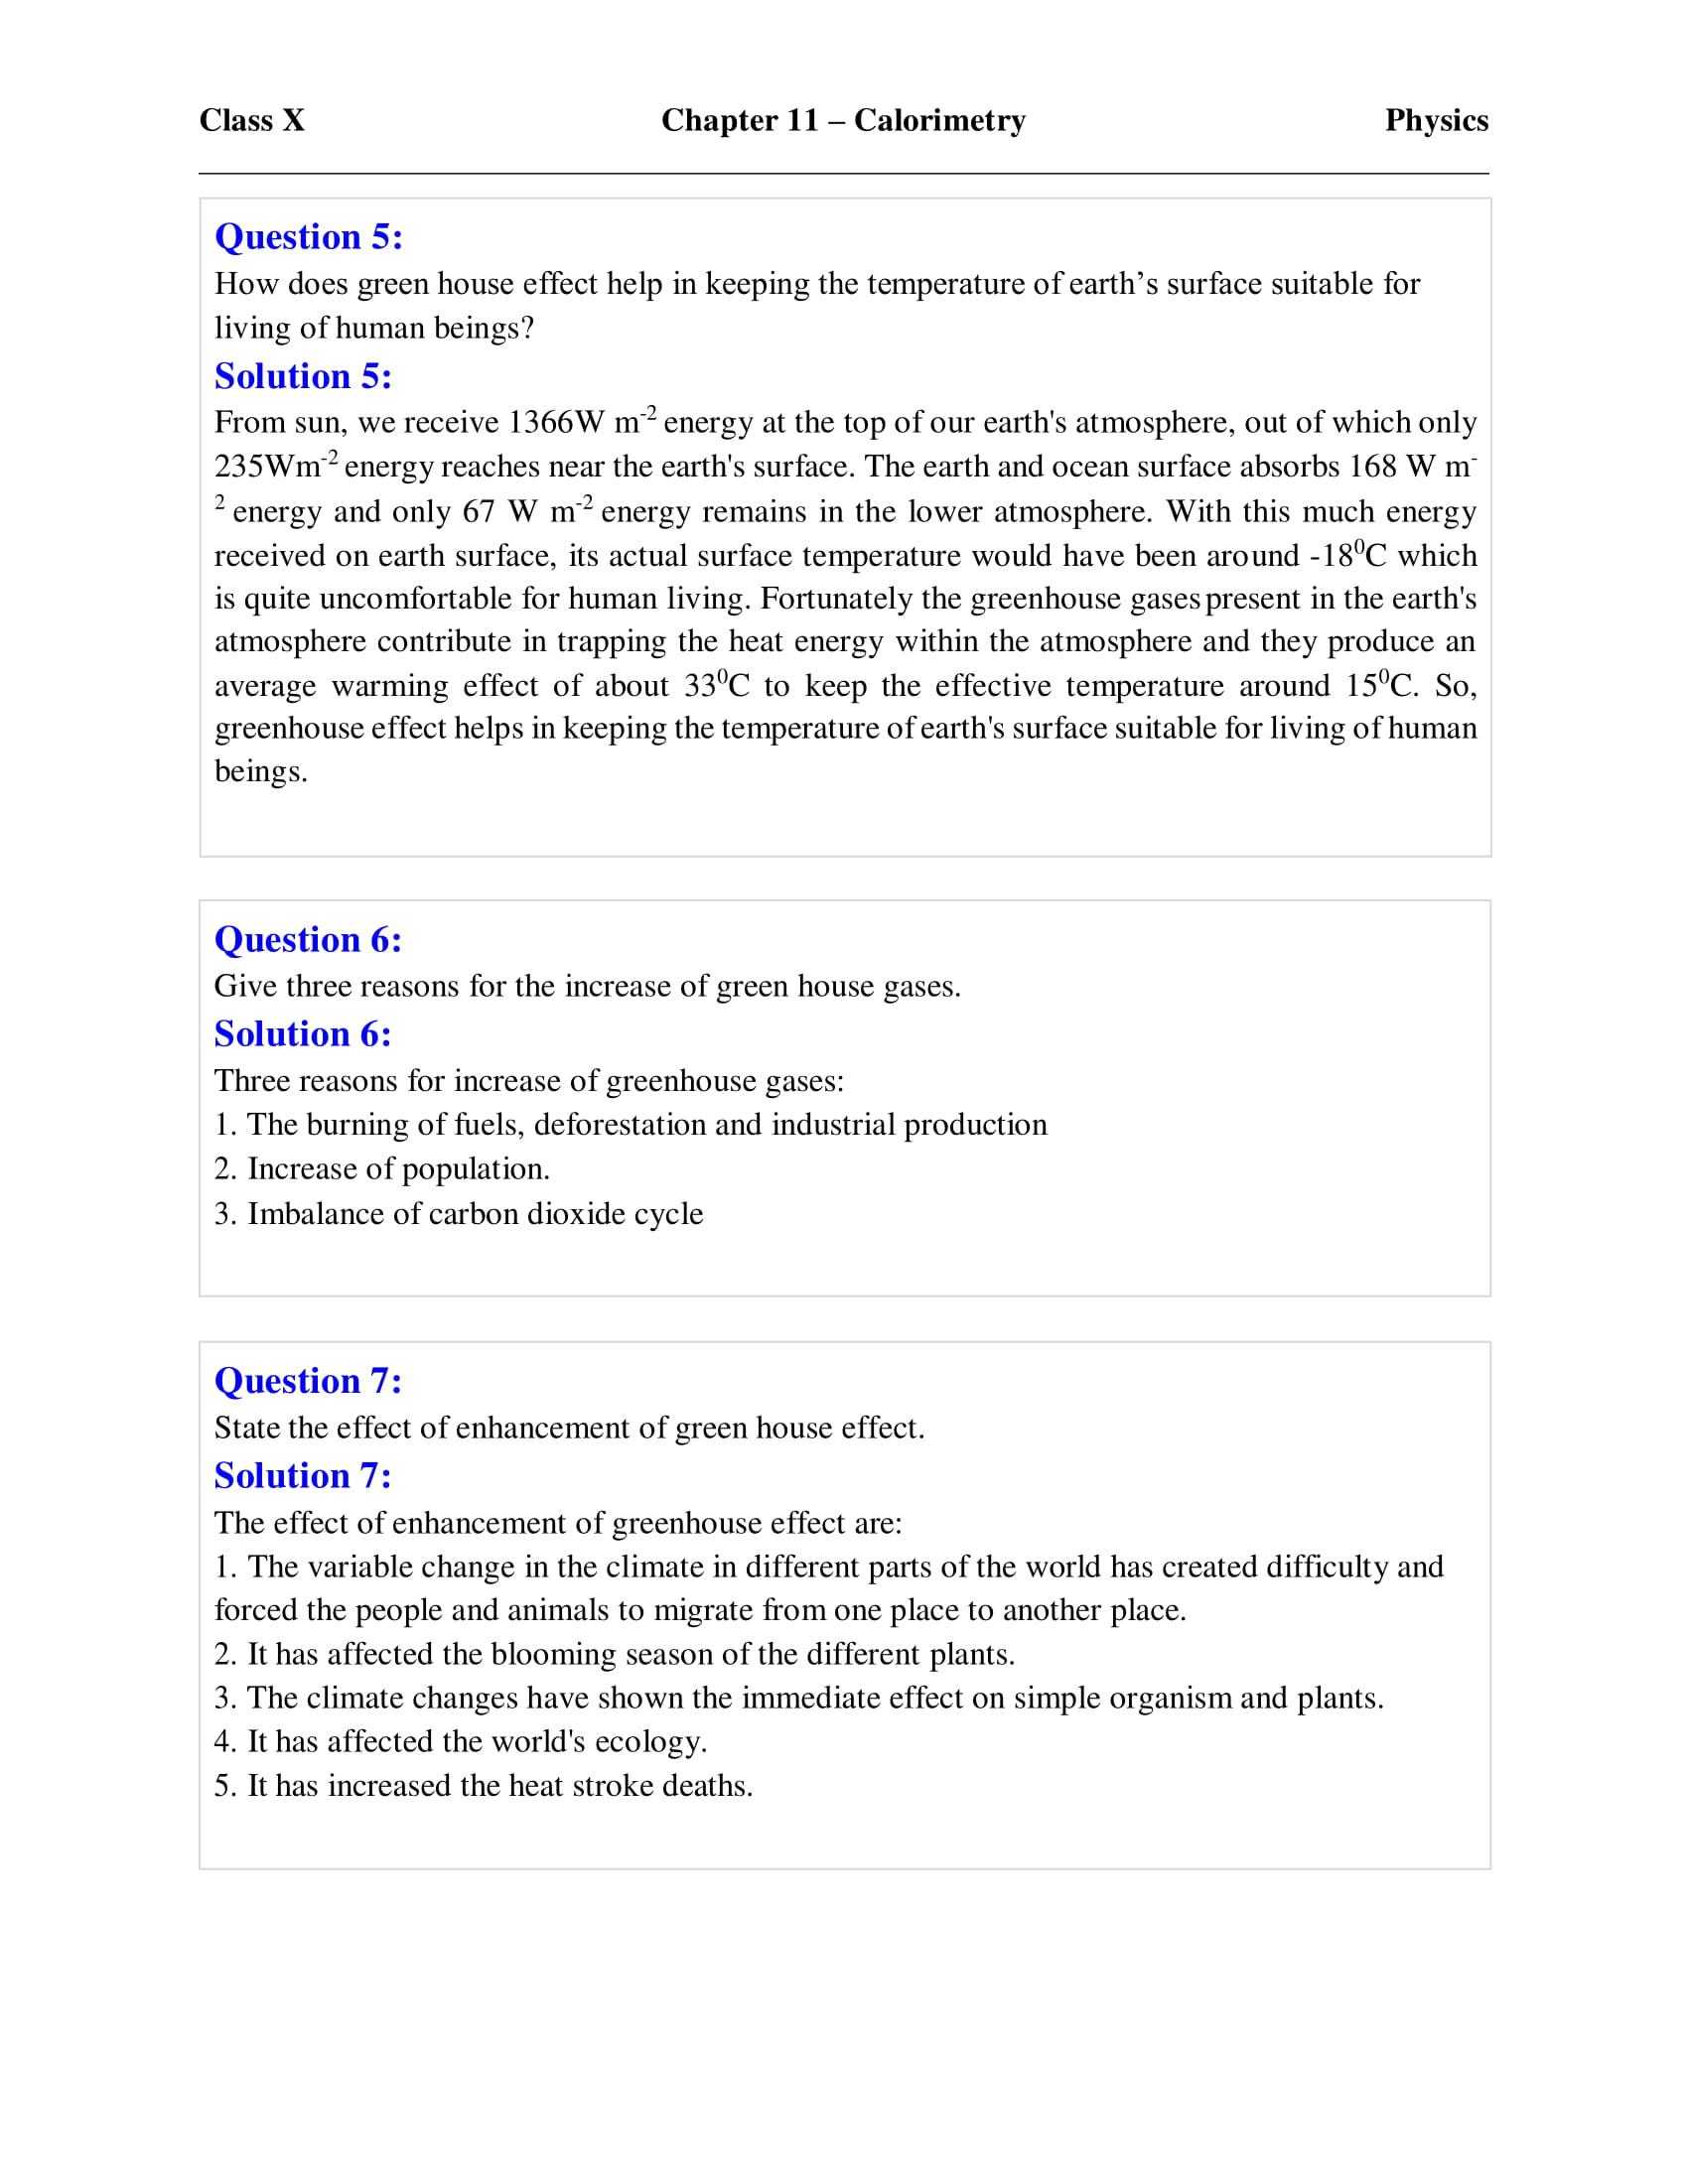 icse-selina-physics-solutions-class-10-chapter-11-calorimetry-32